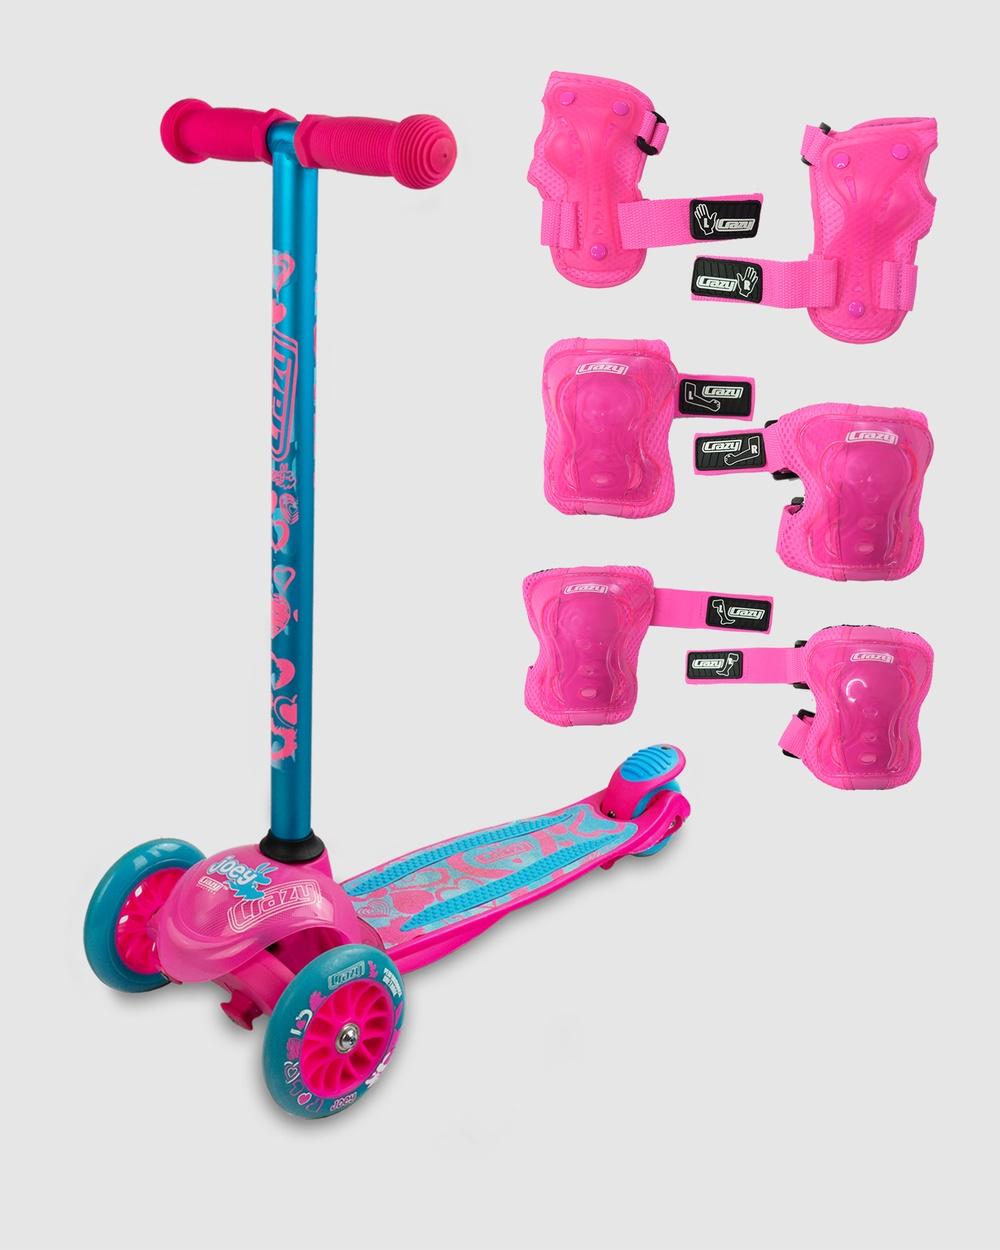 Crazy Skates Joey Hearts All toys Pink Australia